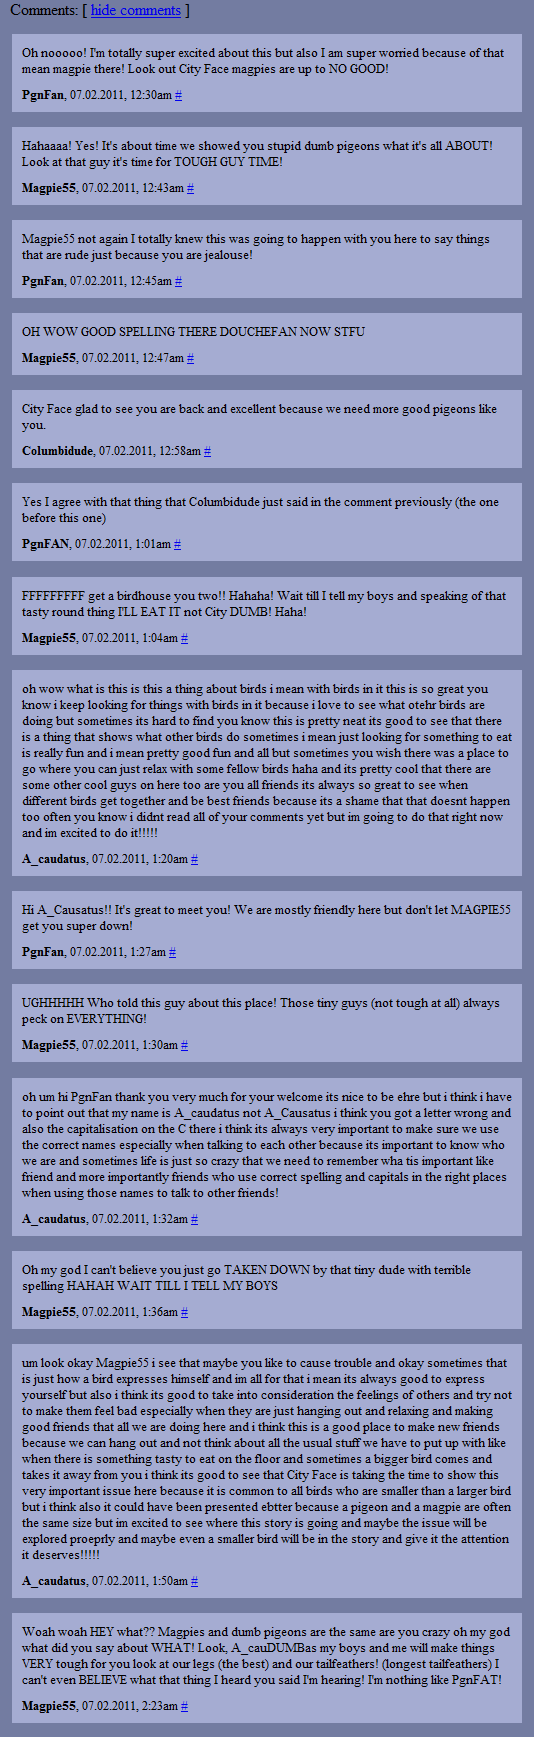 Cityface2 comments 1.png